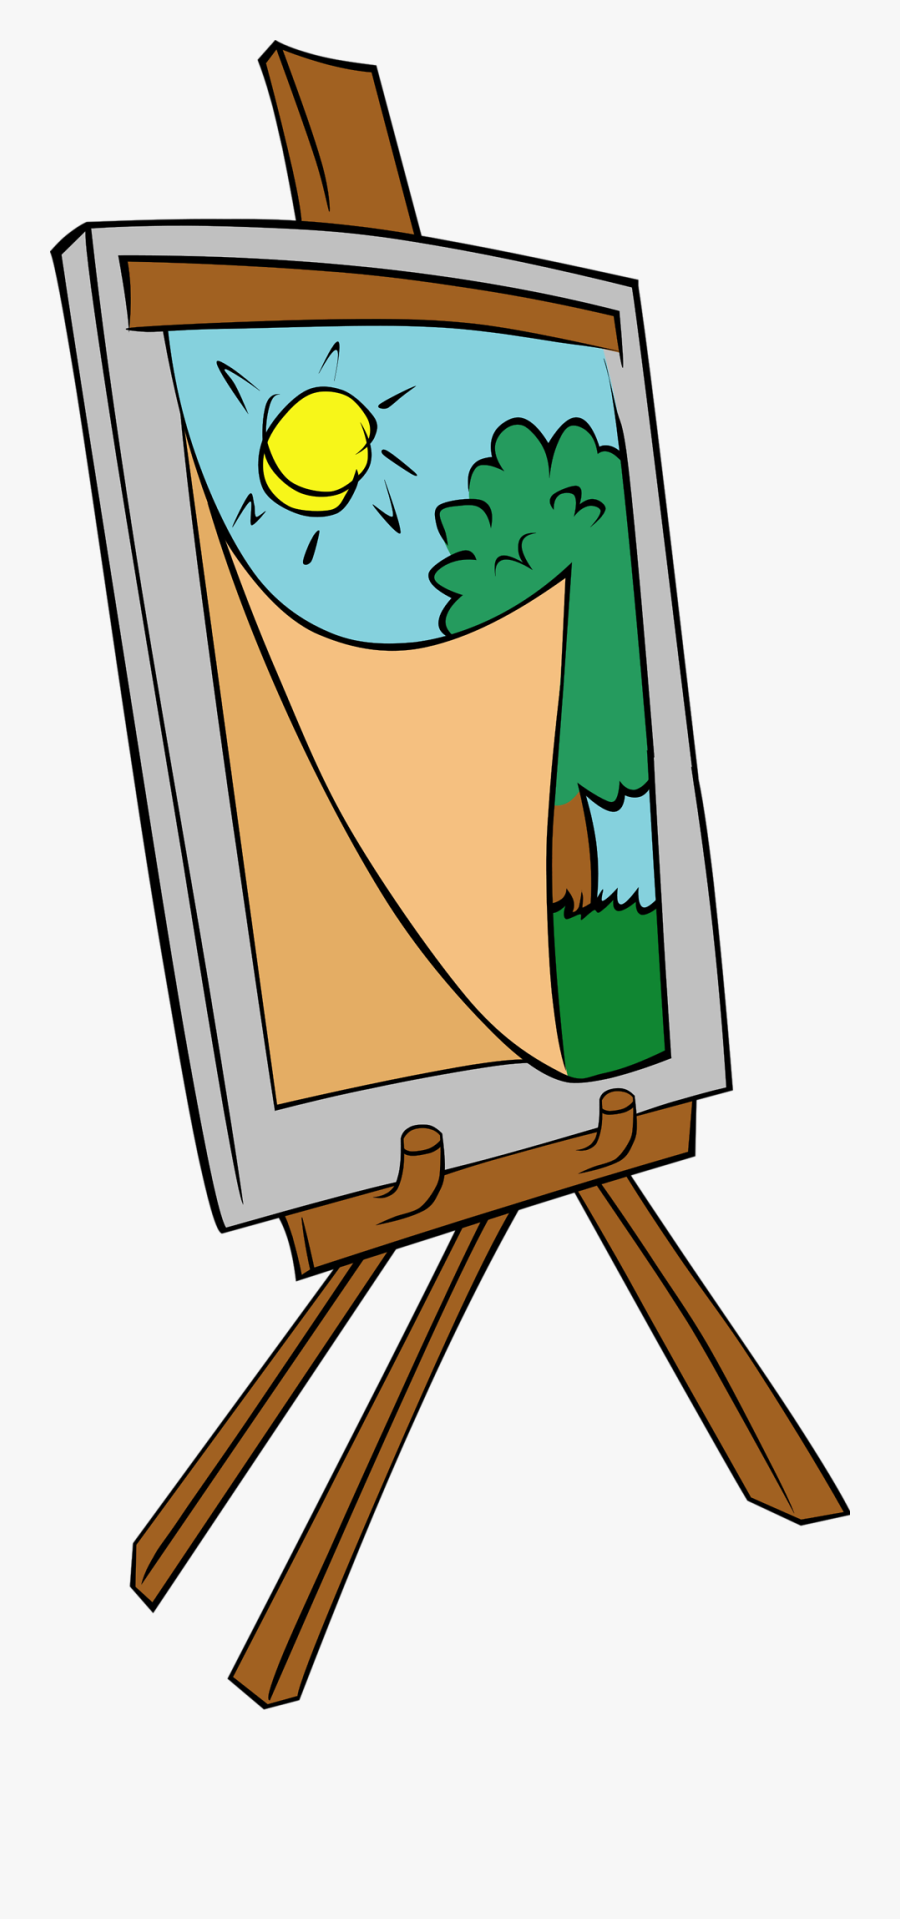 Painting Clipart, Transparent Clipart